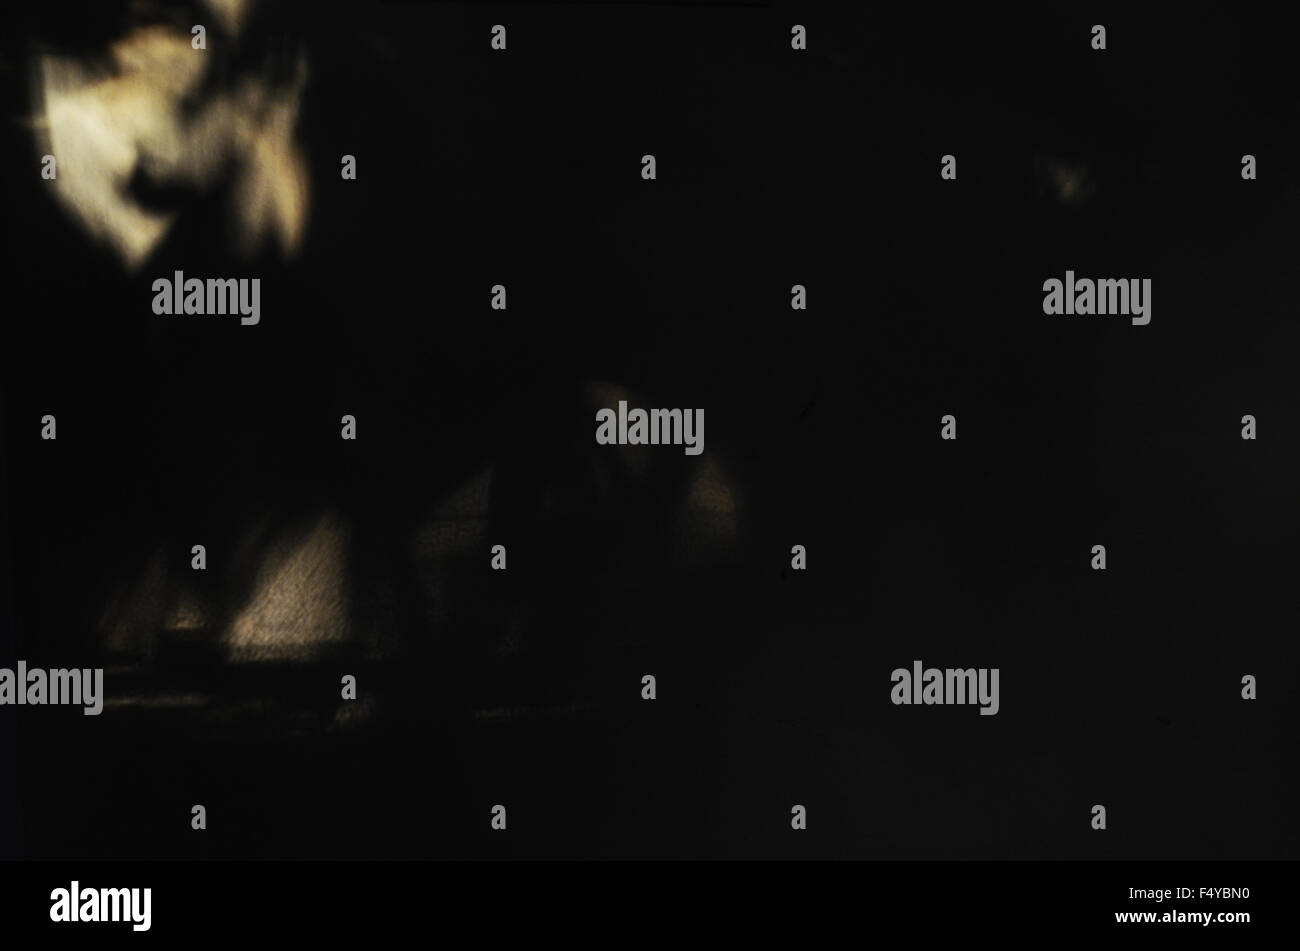 halloween shadows dark darkness scary black images depression angel spiritual - Stock Image